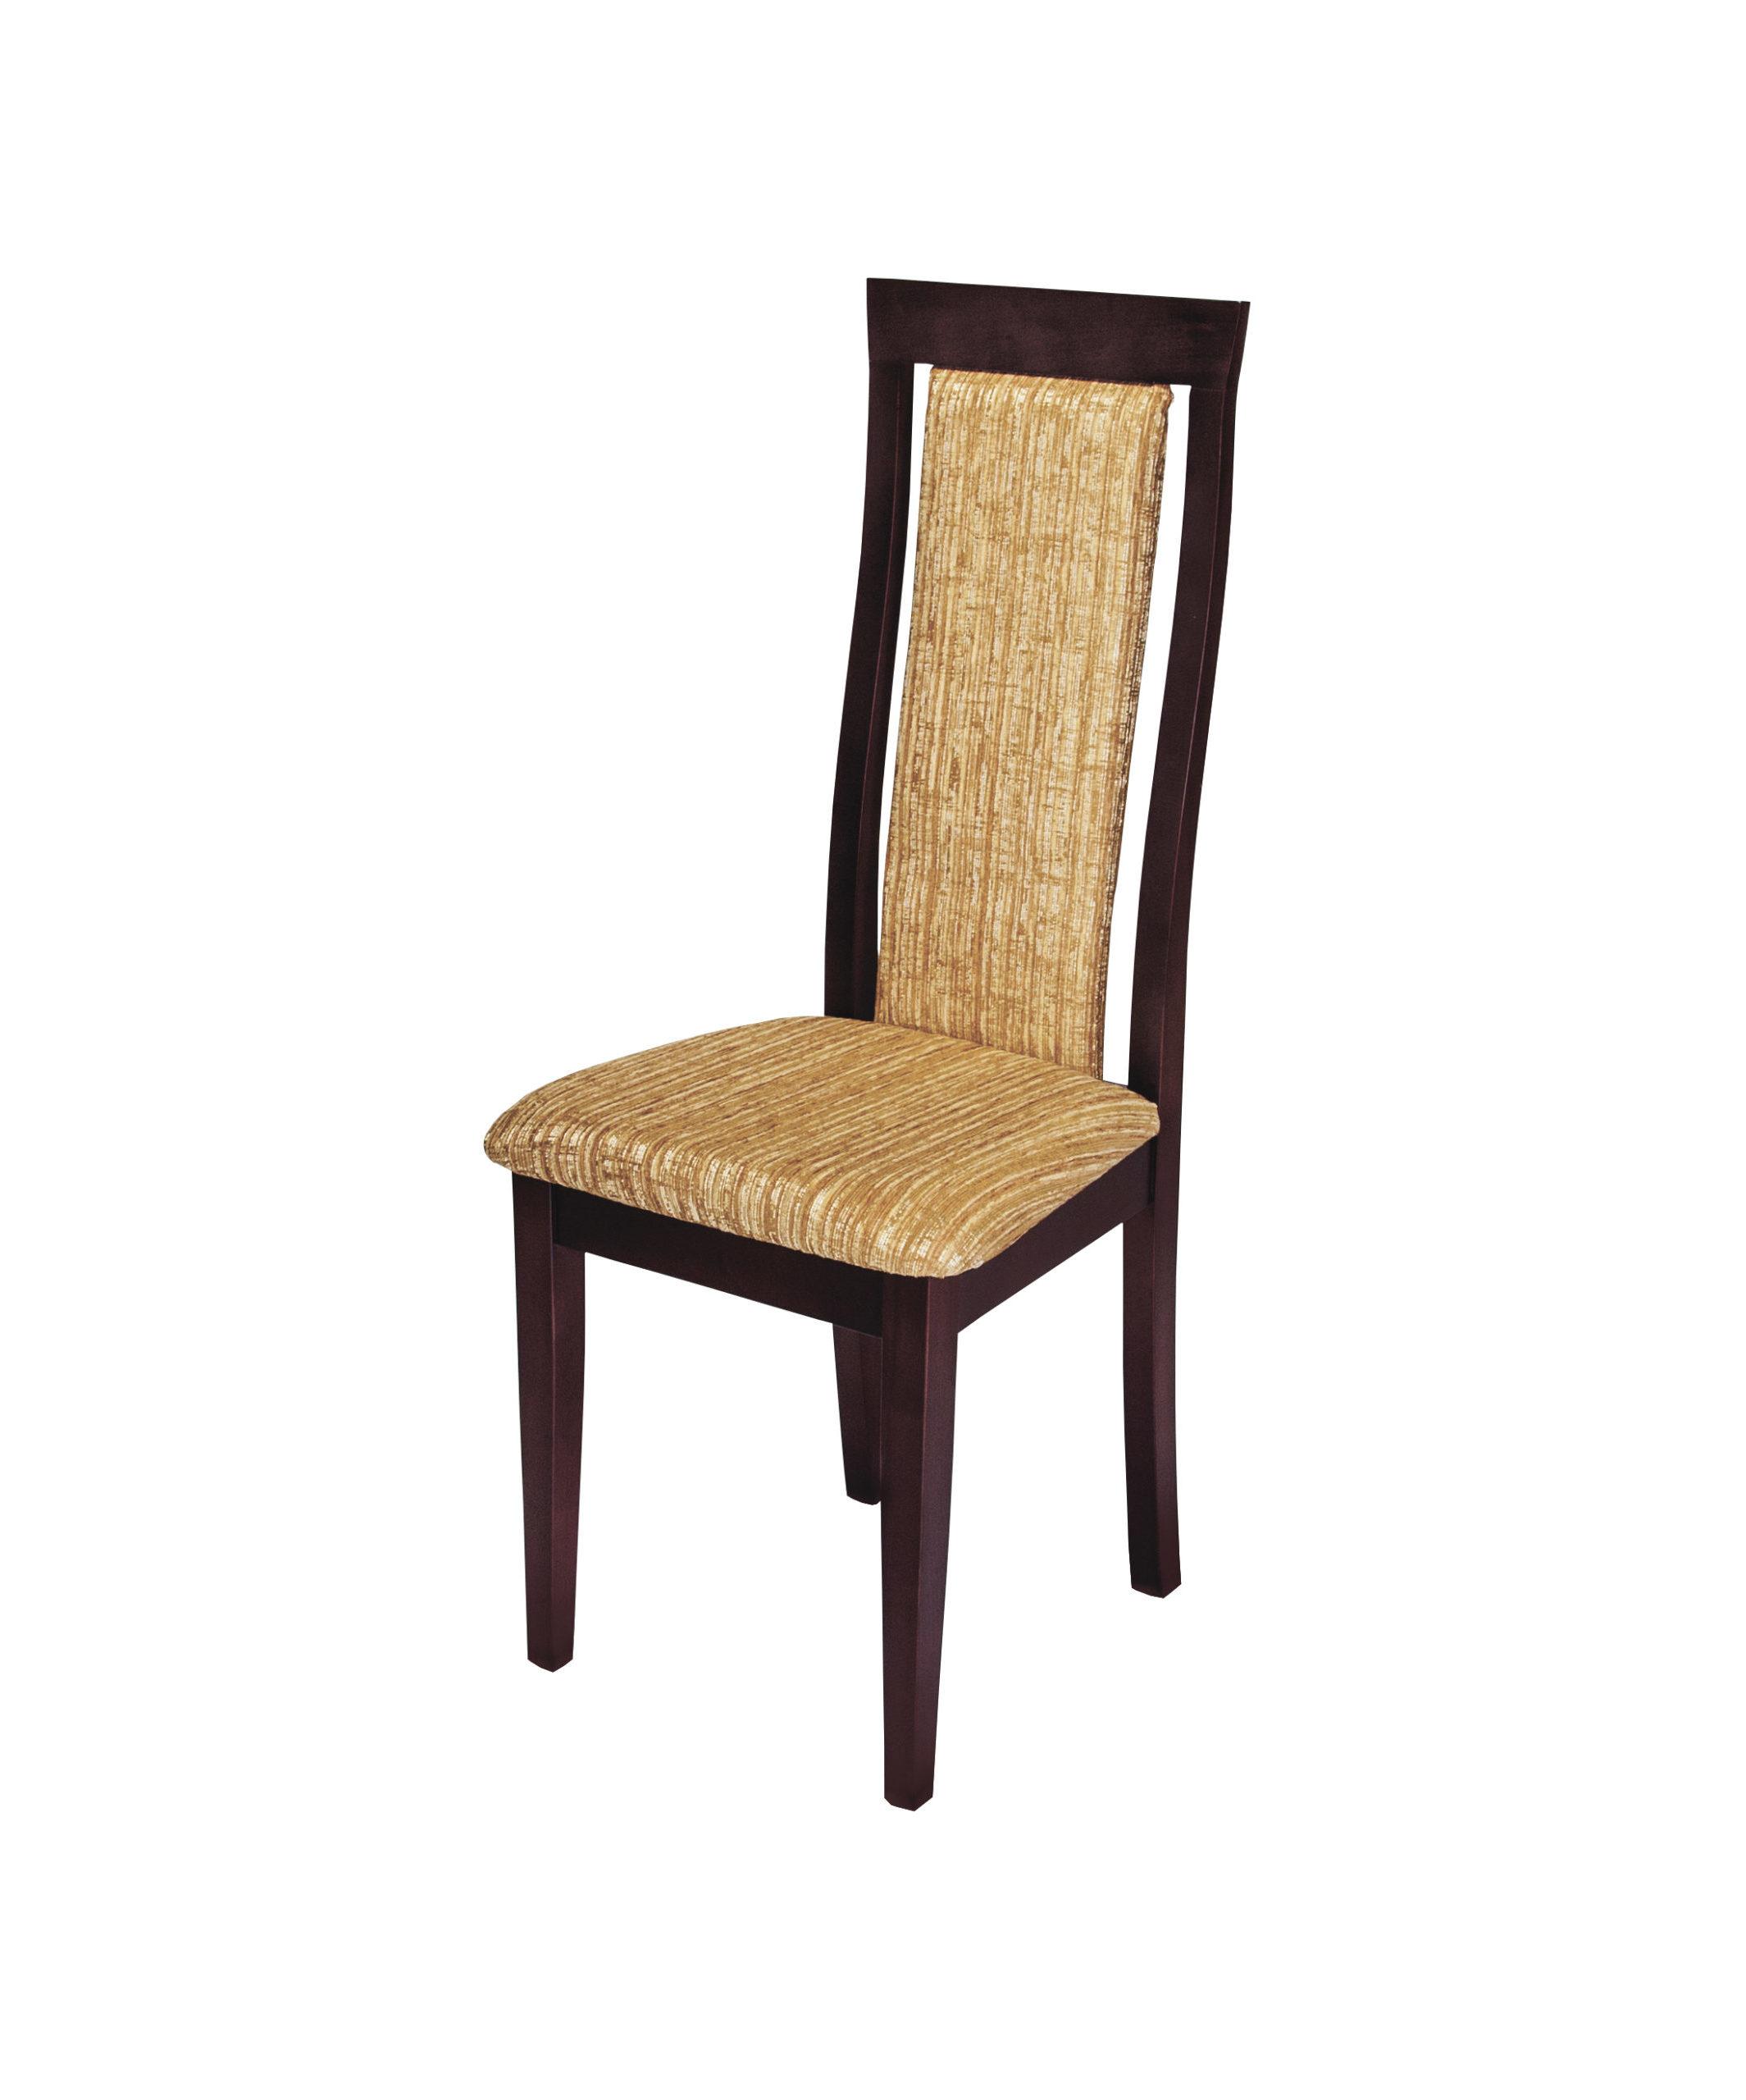 6405. Каркас стула из массива бука.